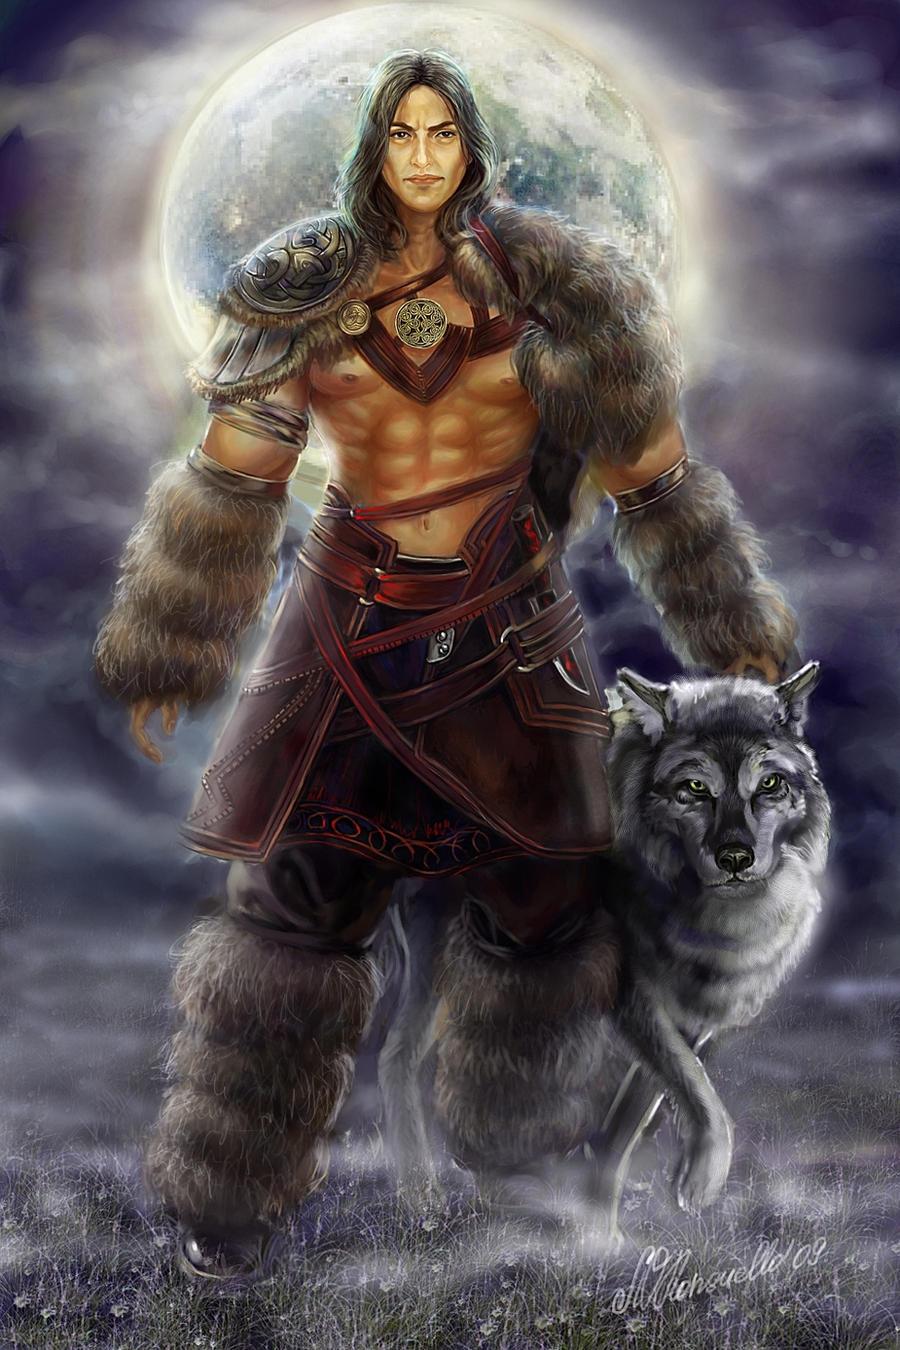 Fantasy warrior men - photo#9